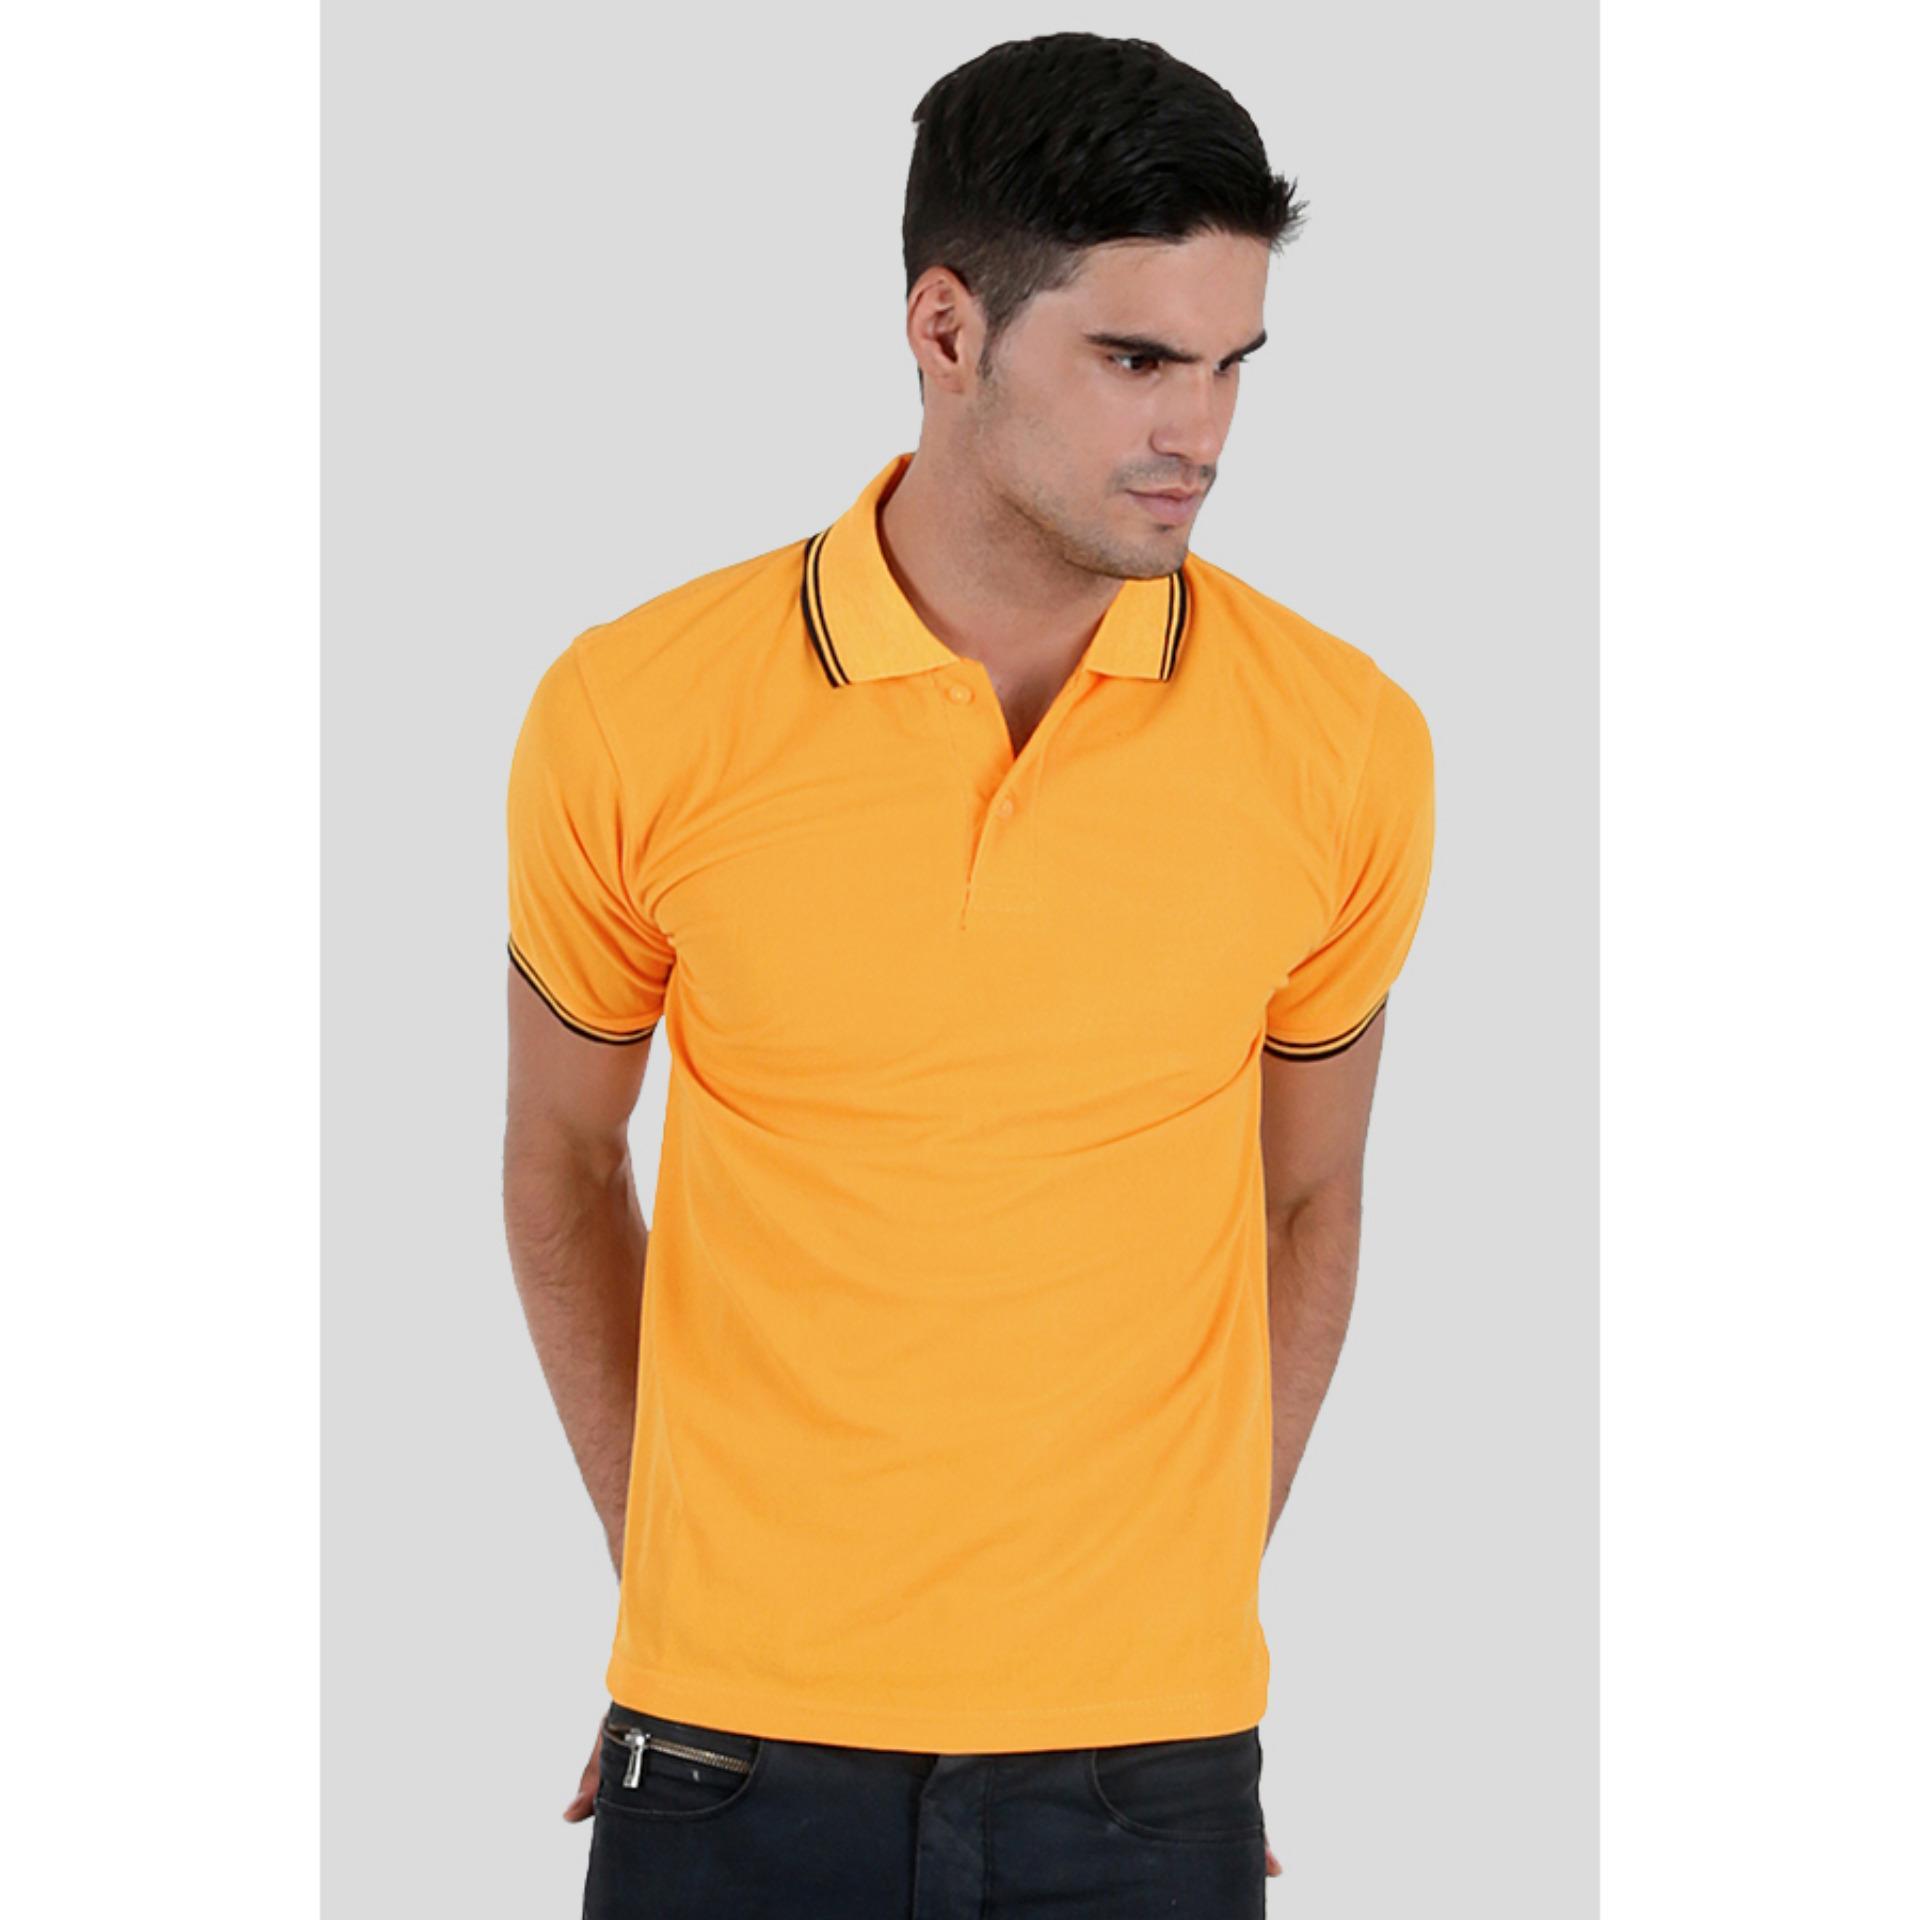 Harga Faseno Kaos Berkerah Polo Shirt Pria Lengan Pendek Kuning Tua Original